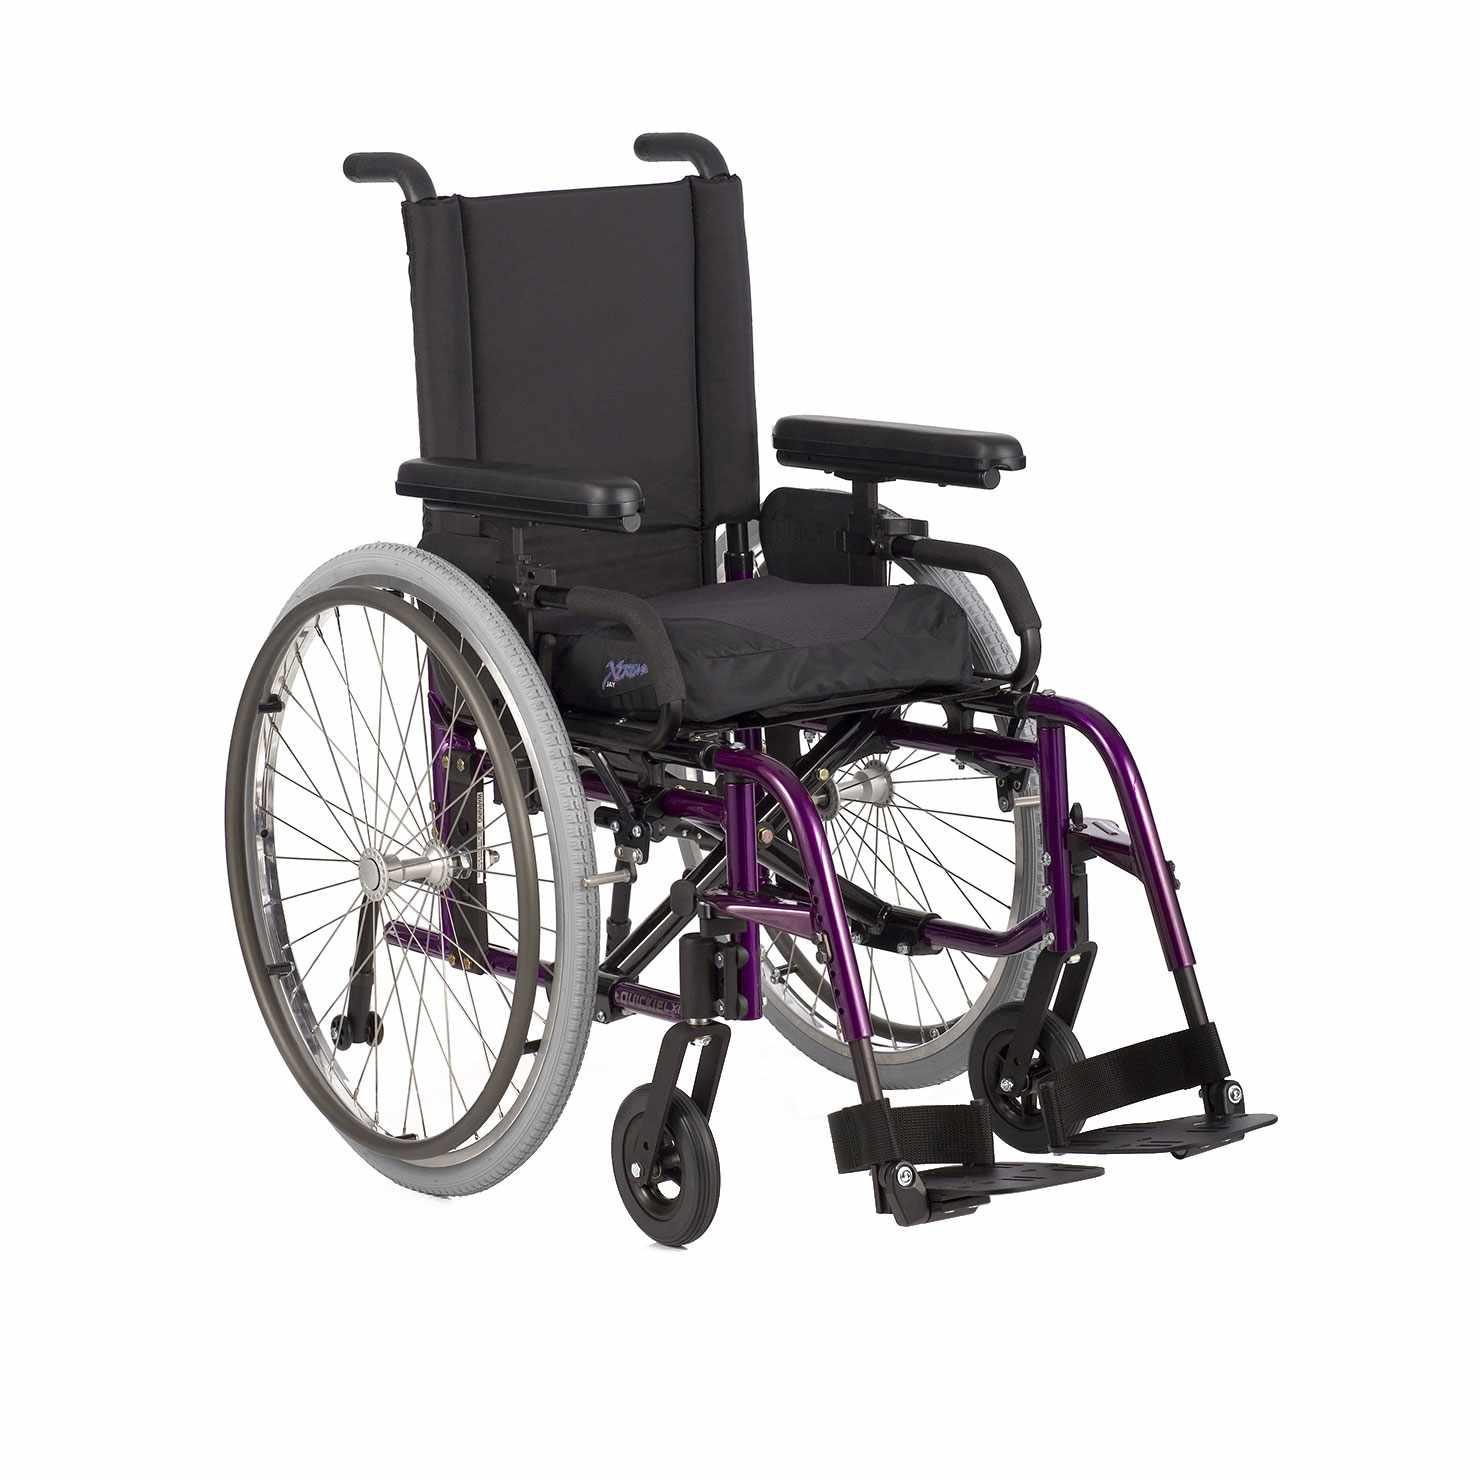 Quickie LX folding ultralight wheelchair